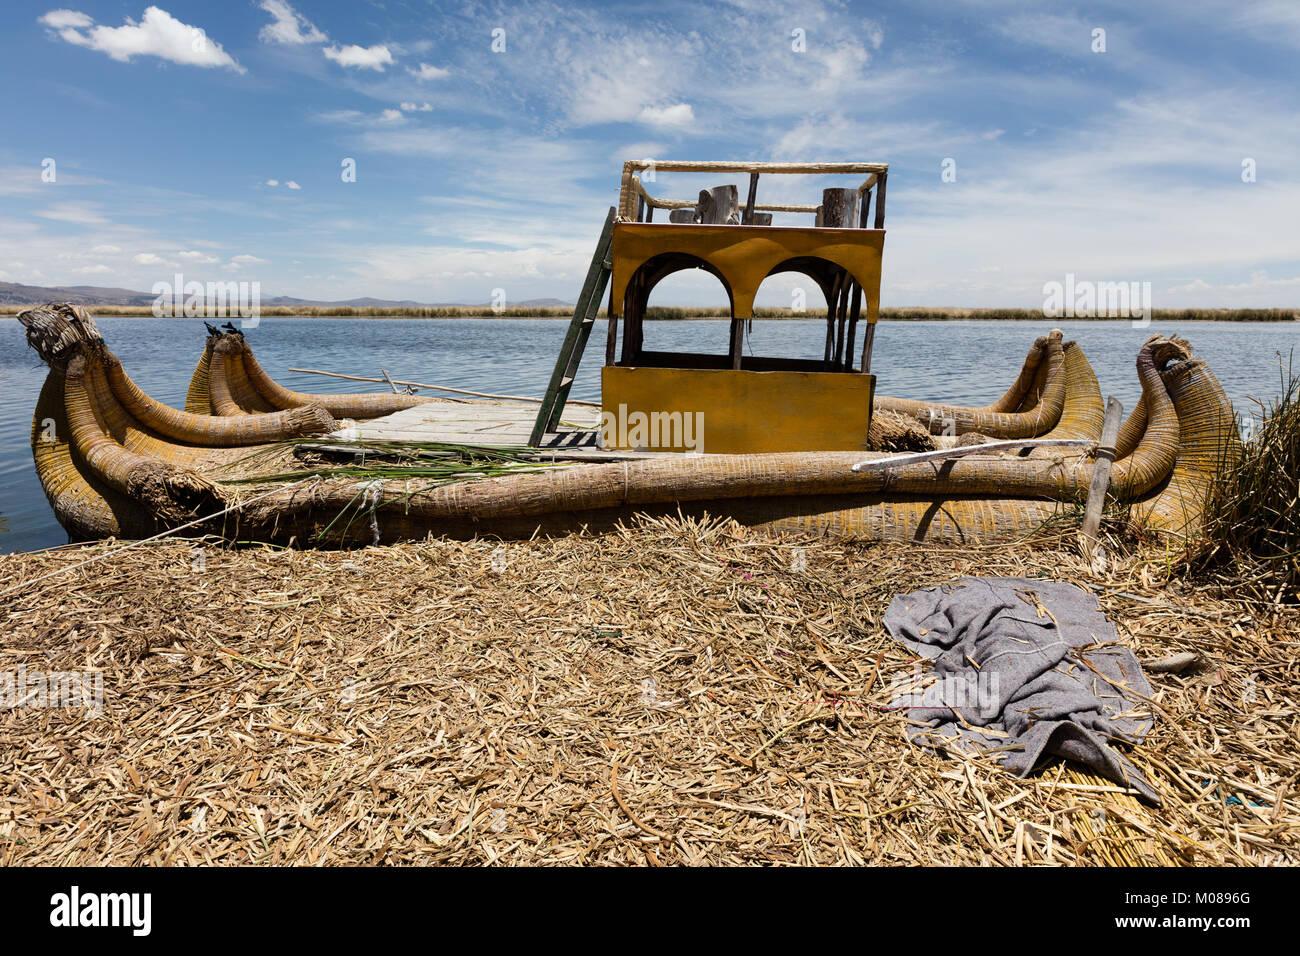 Traditional reed boat (totora) in the Uros Islands, Titicaca Lake or Titikaka Lake, Peru, South America - Stock Image